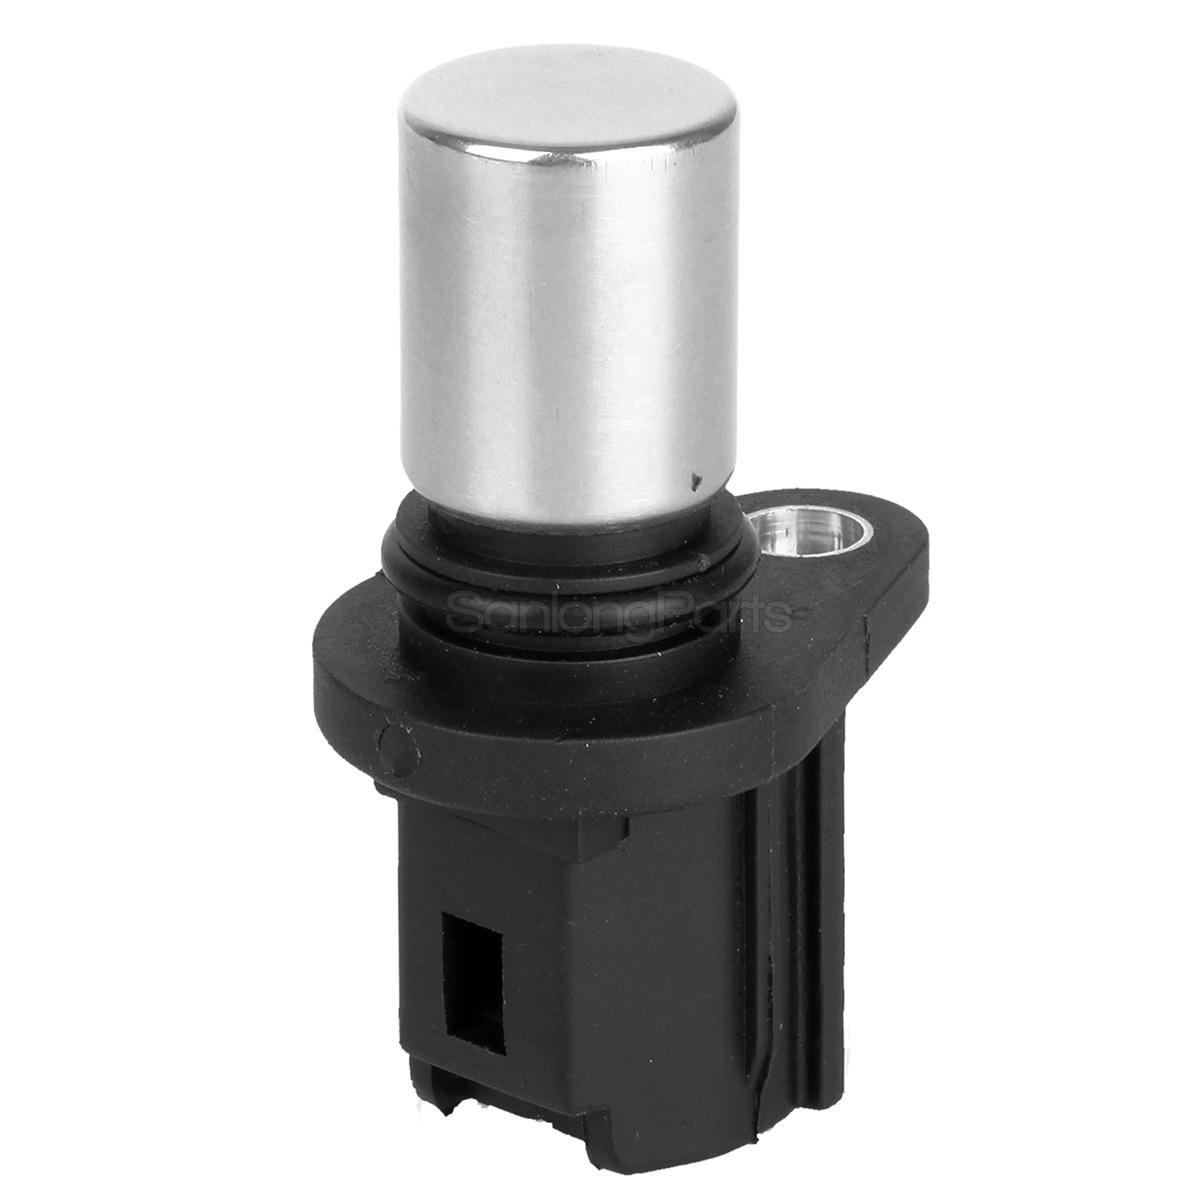 Camshaft Position Sensor Pc216 For Toyota Camry Solara